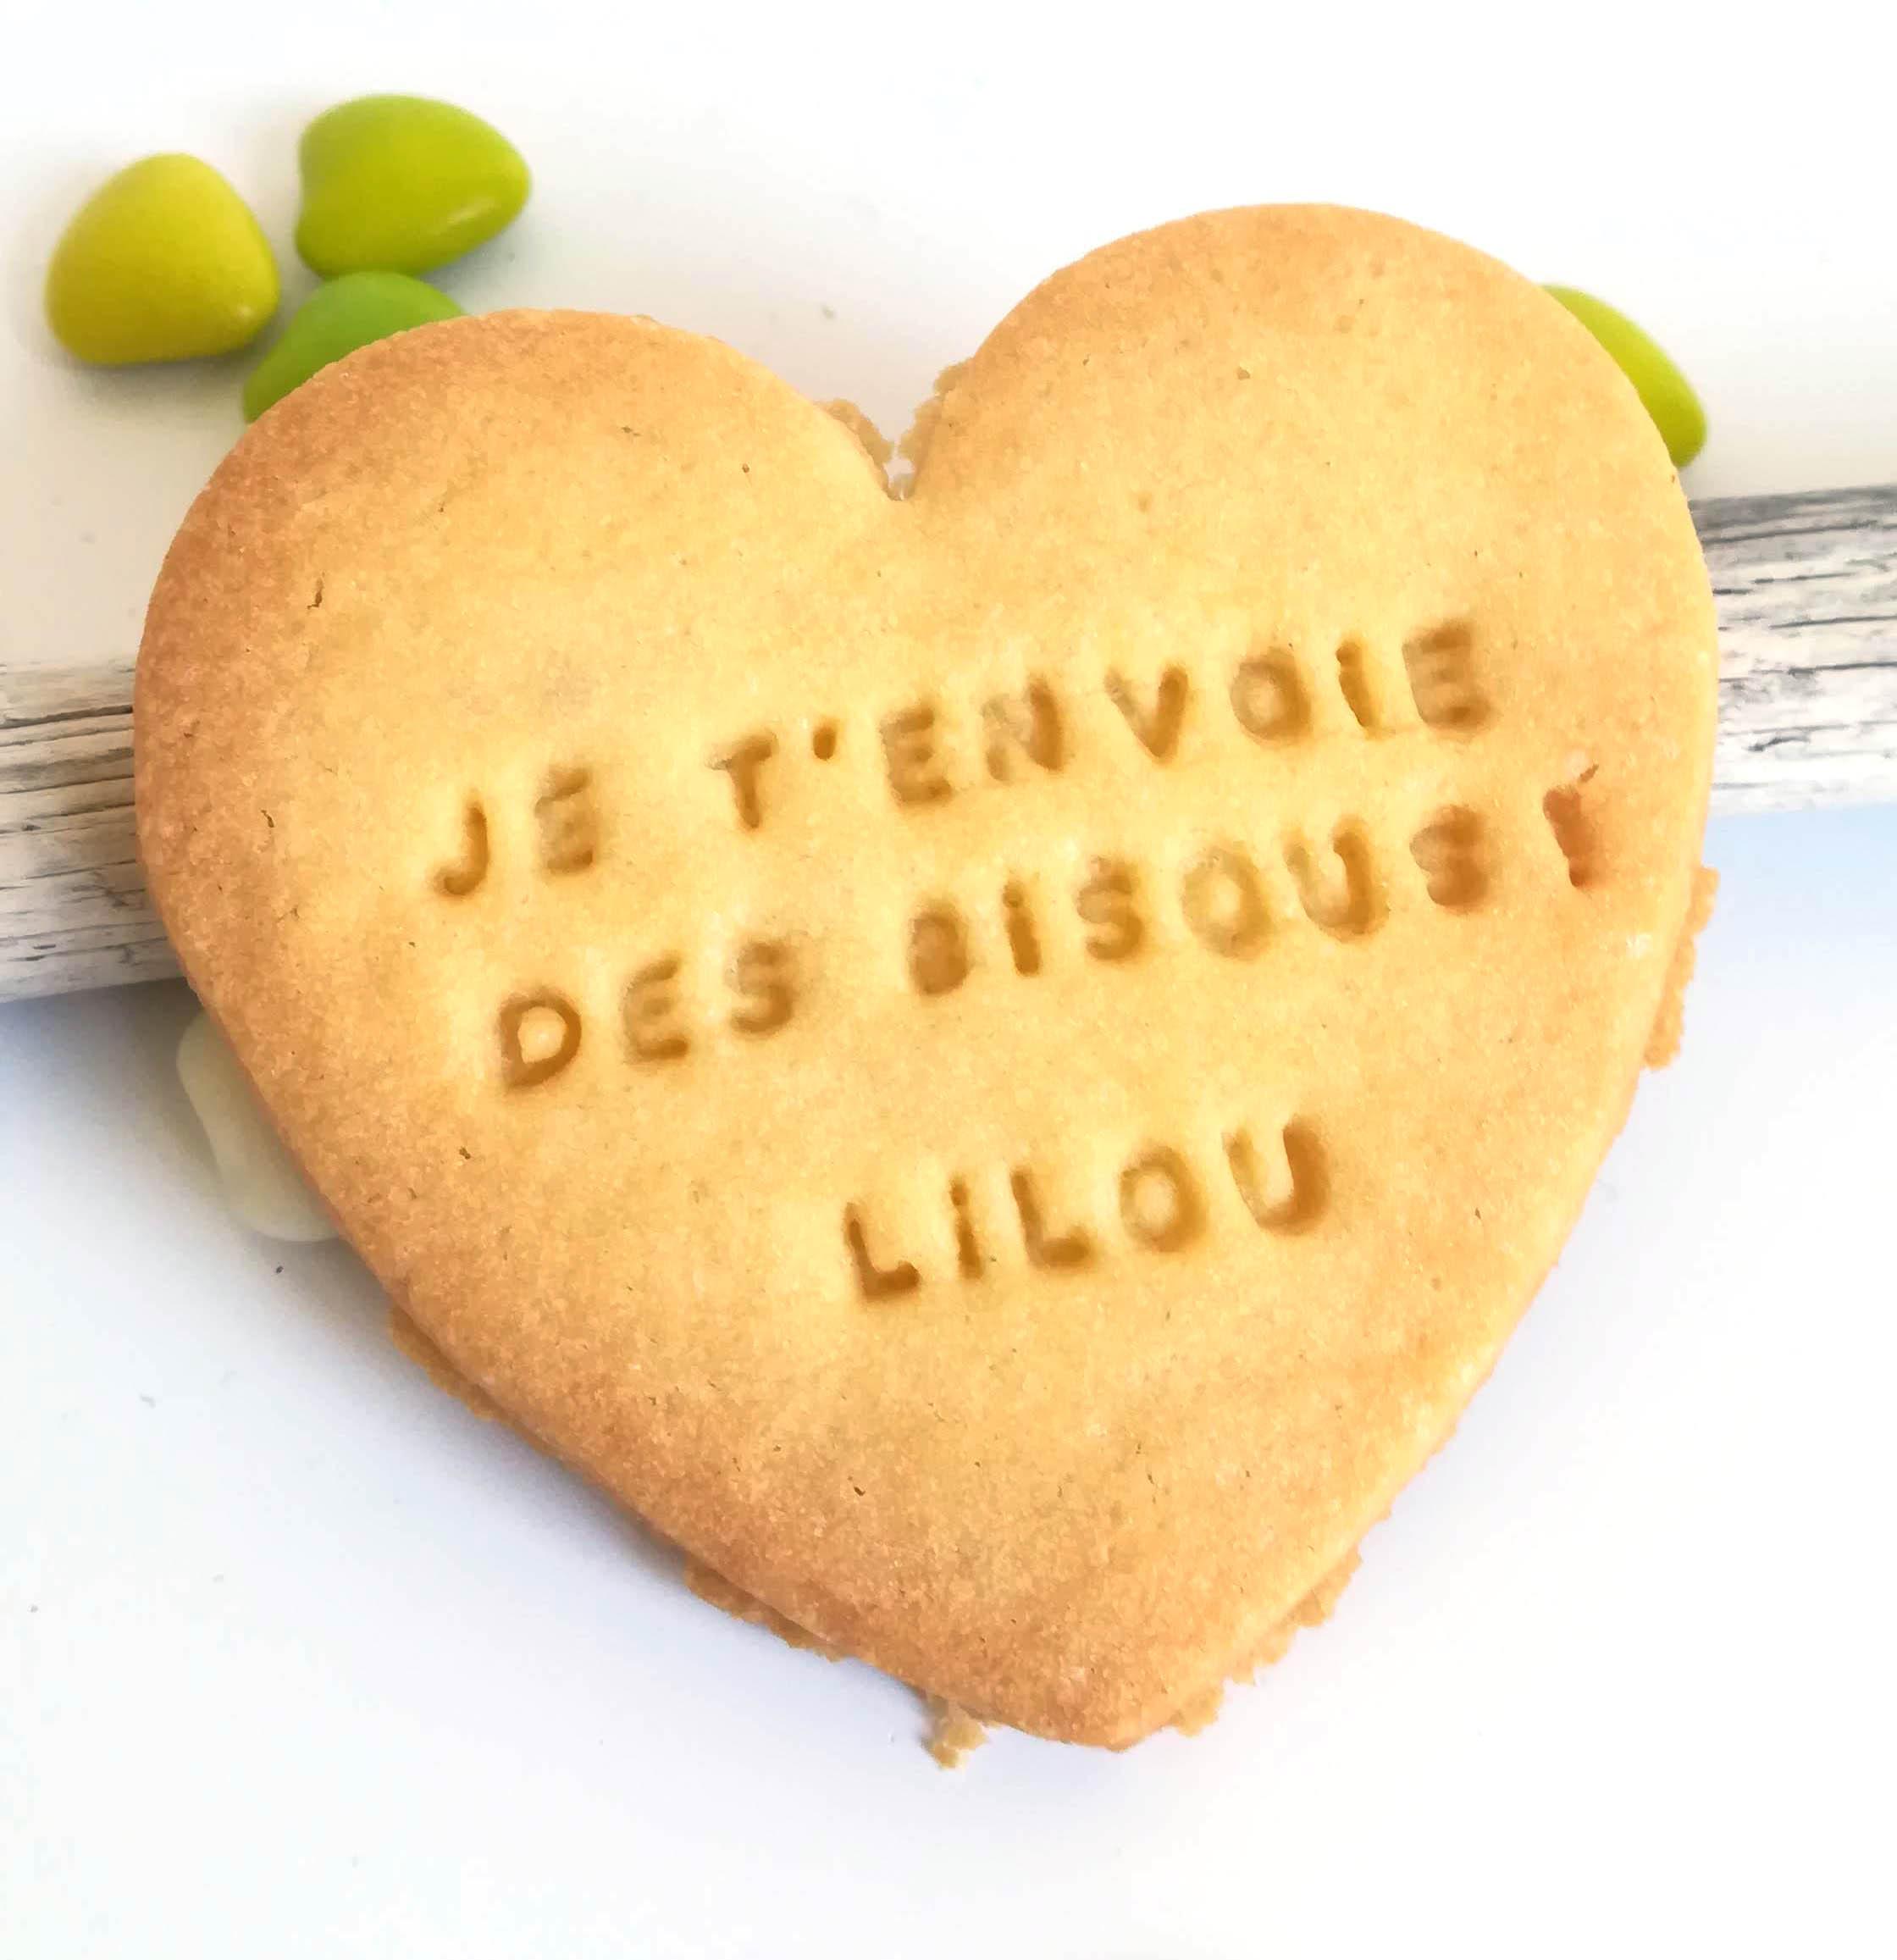 biscuit coeur, bisous message mamie